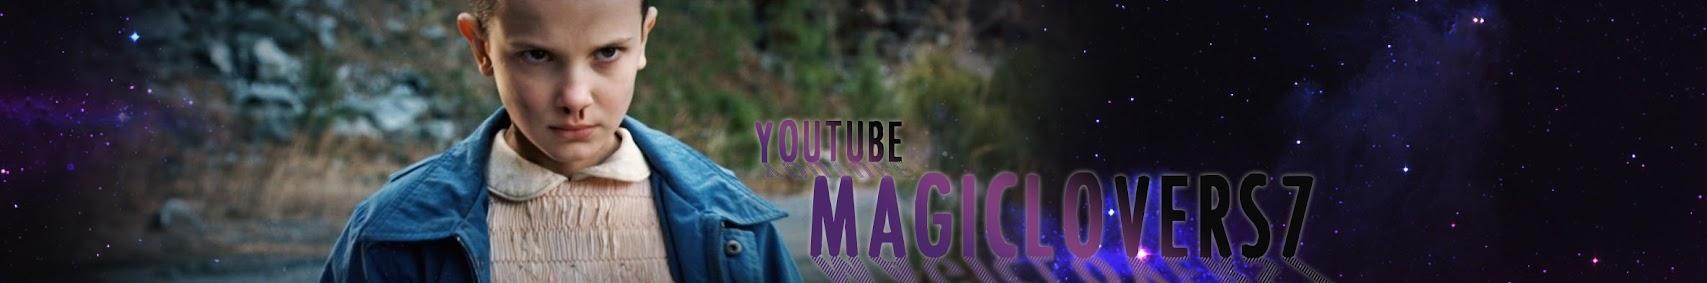 Magiclovers7